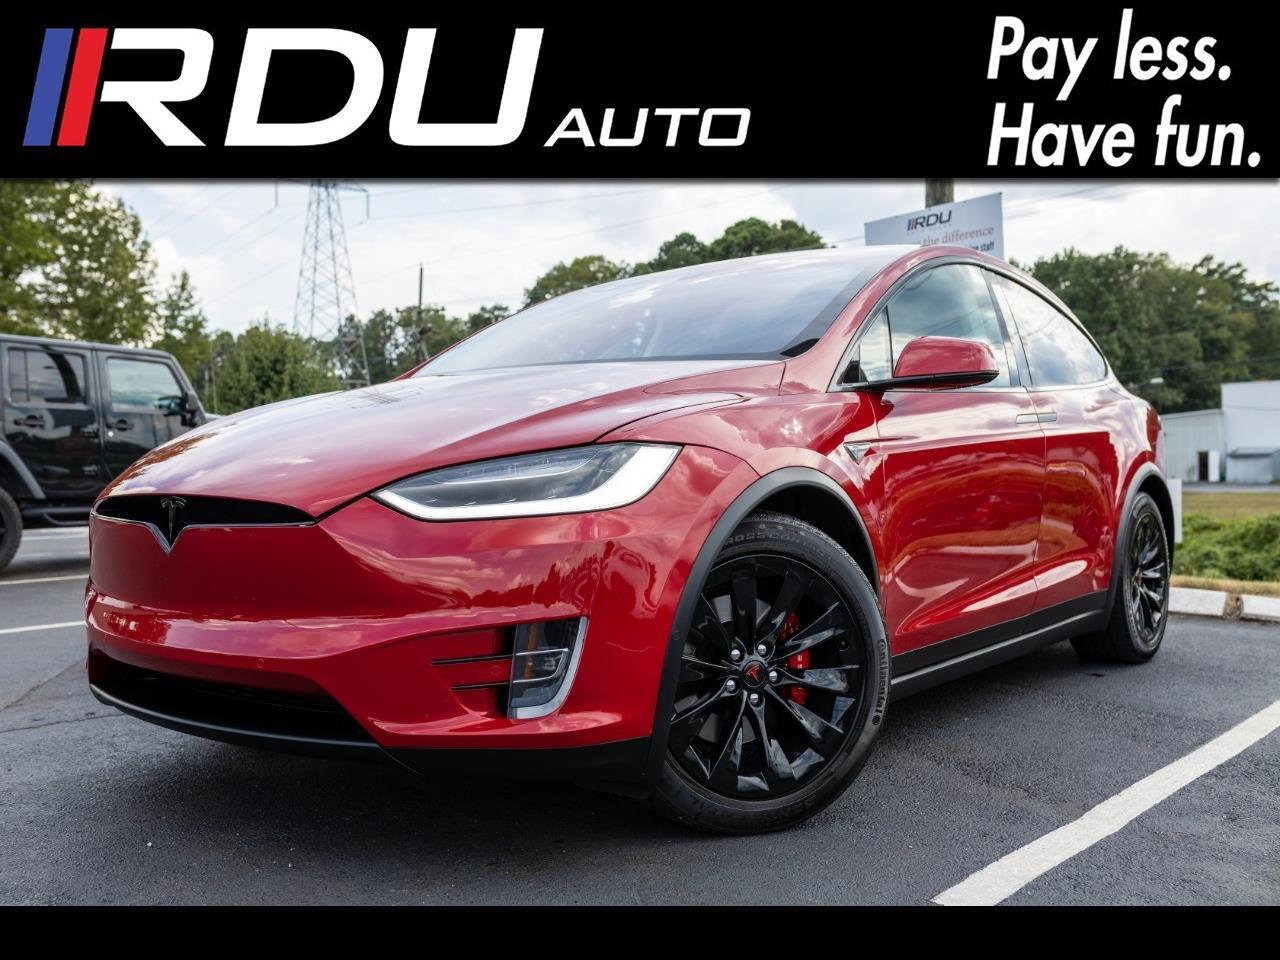 2016 Tesla Model X 90D Auto Pilot Free Supercharging